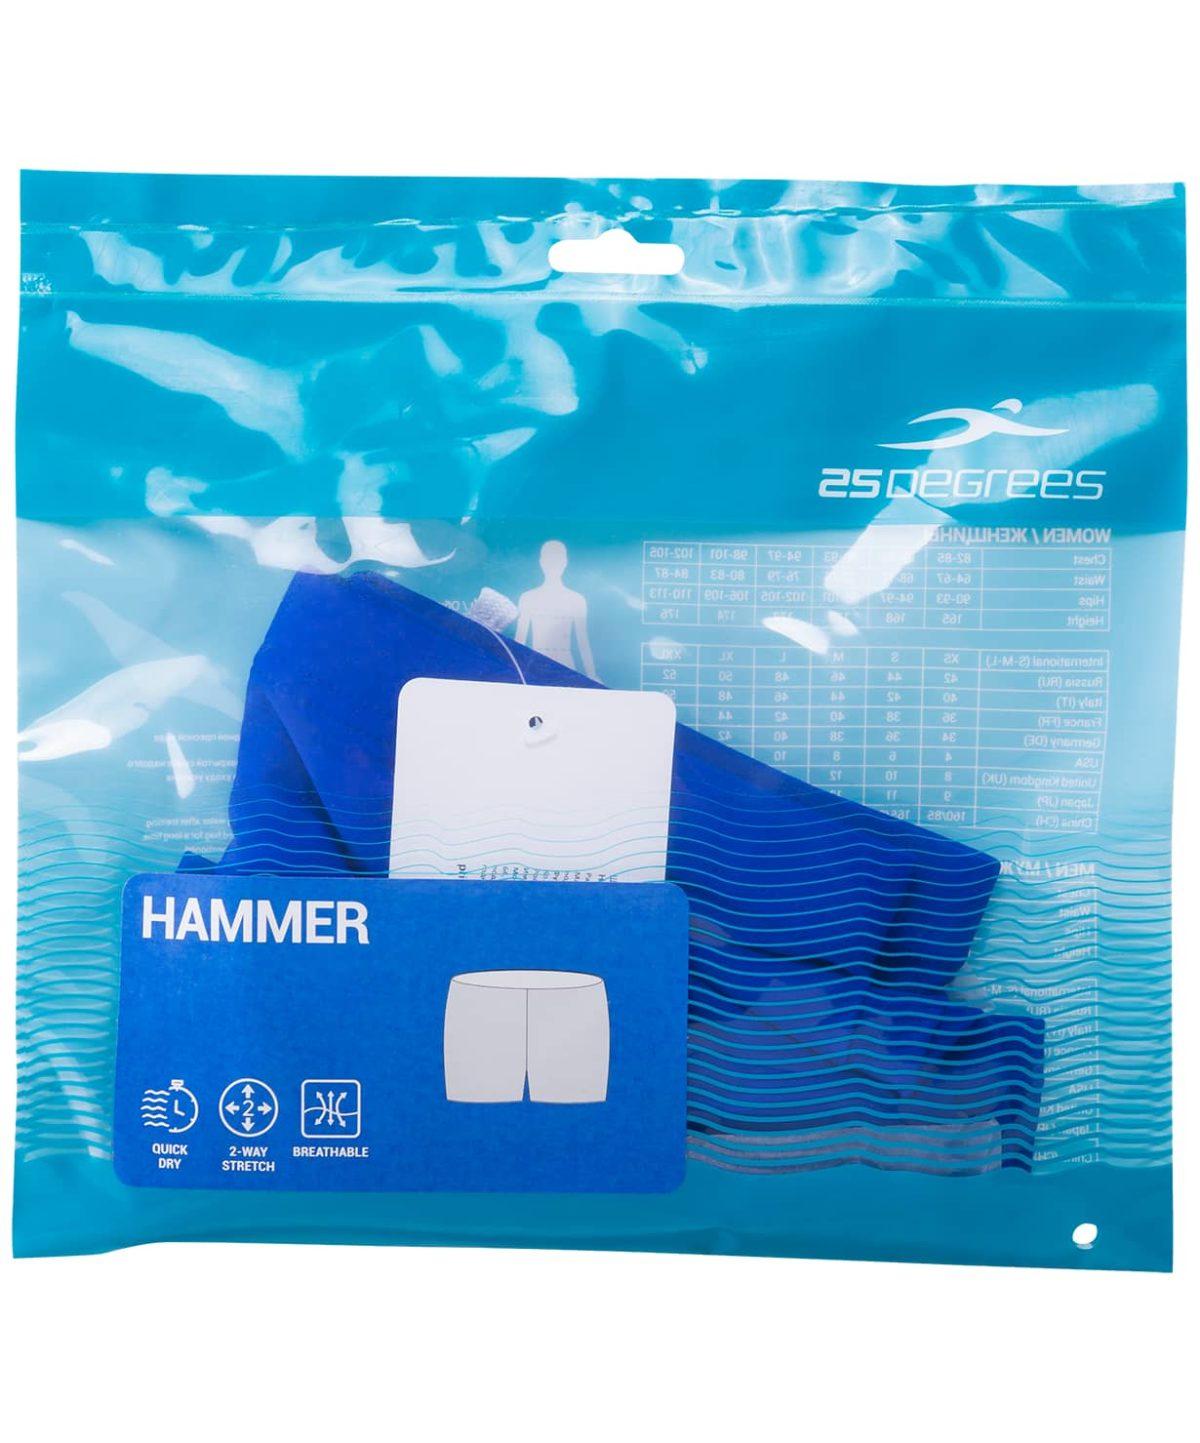 25DEGREES Hammer Blue Шорты для плавания детские, полиамид  17561 - 5